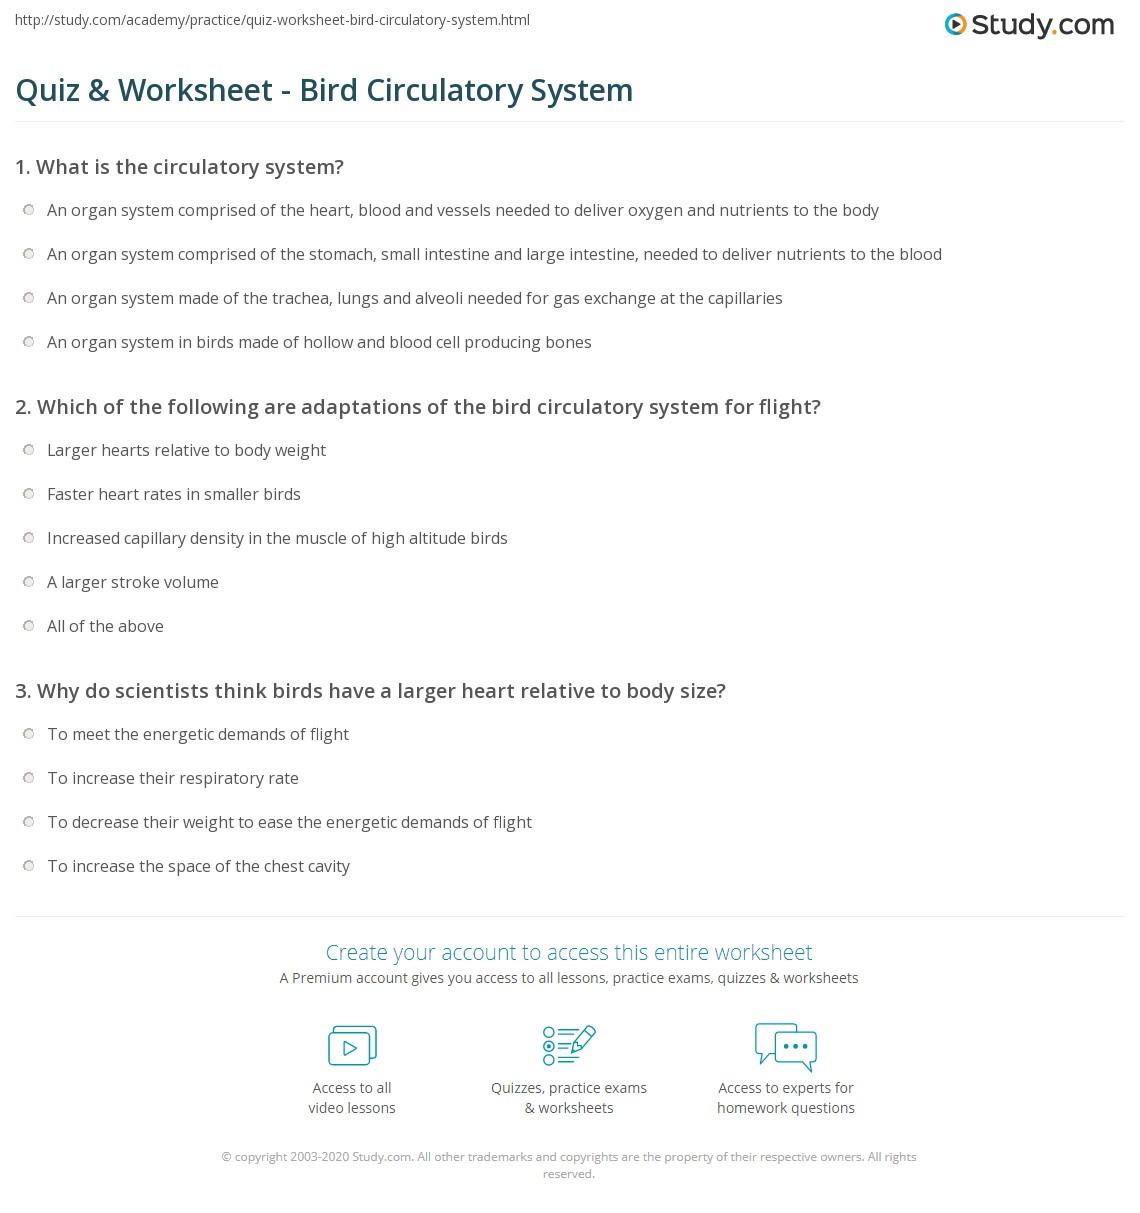 Quiz & Worksheet - Bird Circulatory System | Study.com